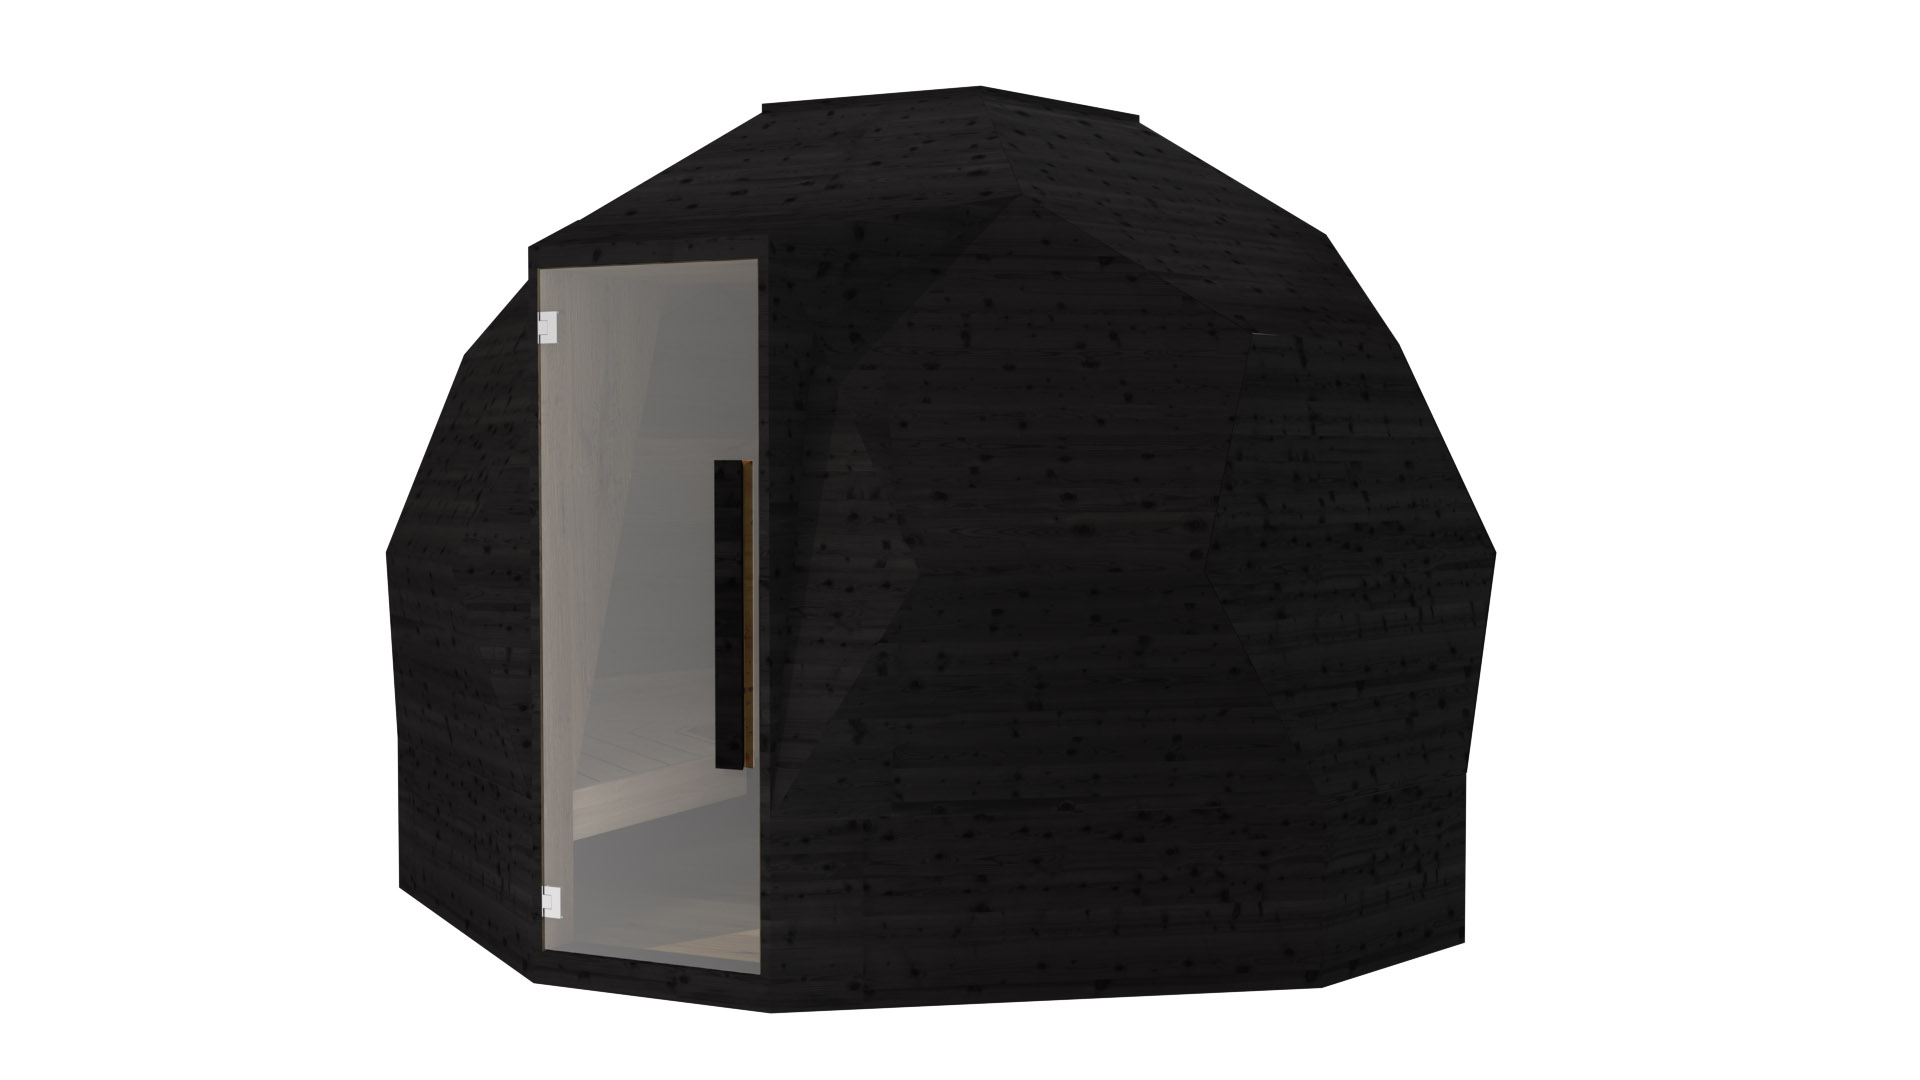 INUA Odin Geodatisk udendoers Finsk sauna1